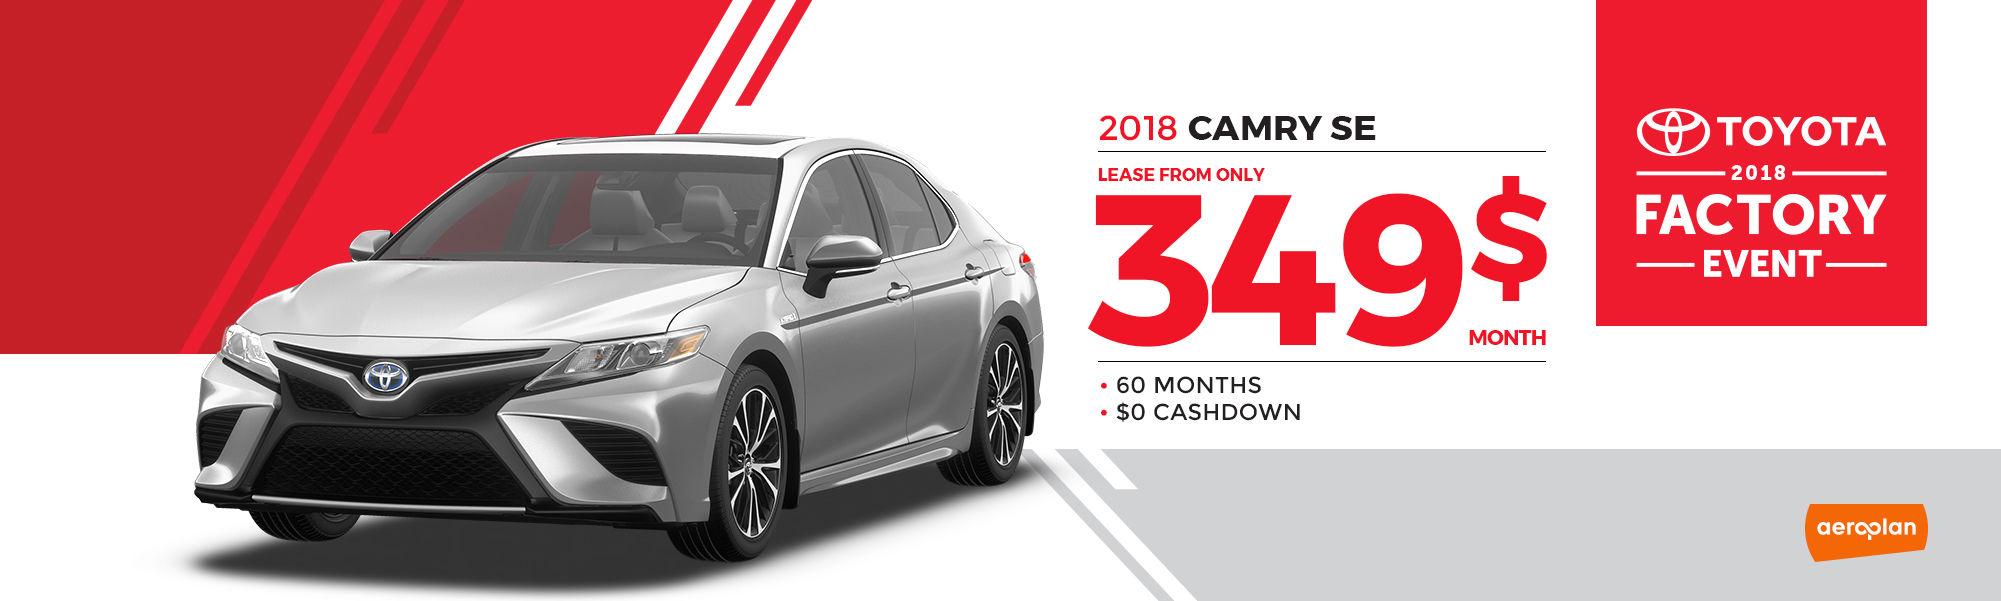 2018 CAMRY SE